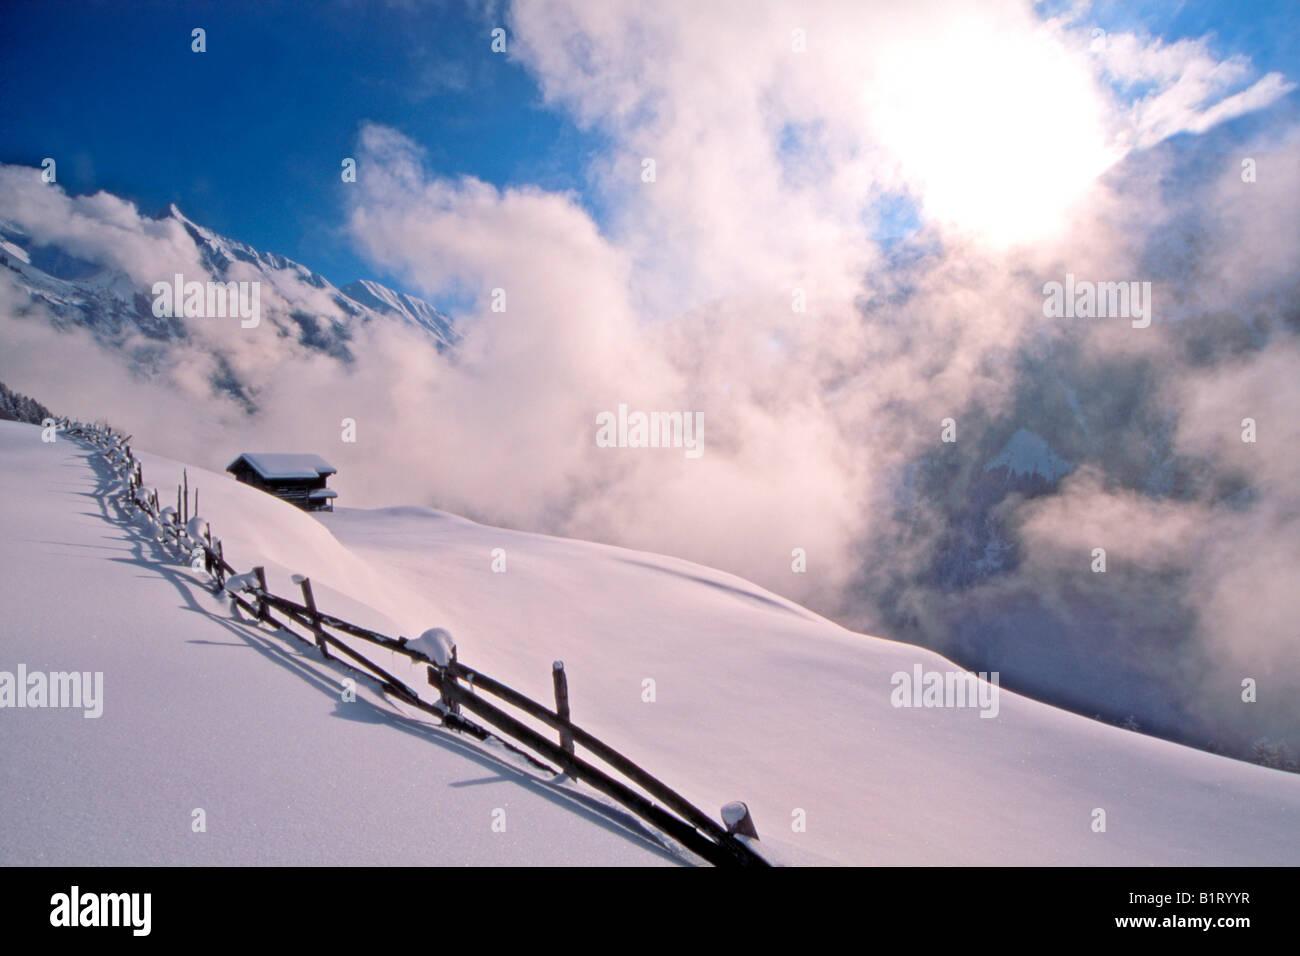 Barn in the snow, Brandberg, Zillertal Valley, Tirol, Austria, Europe Stock Photo